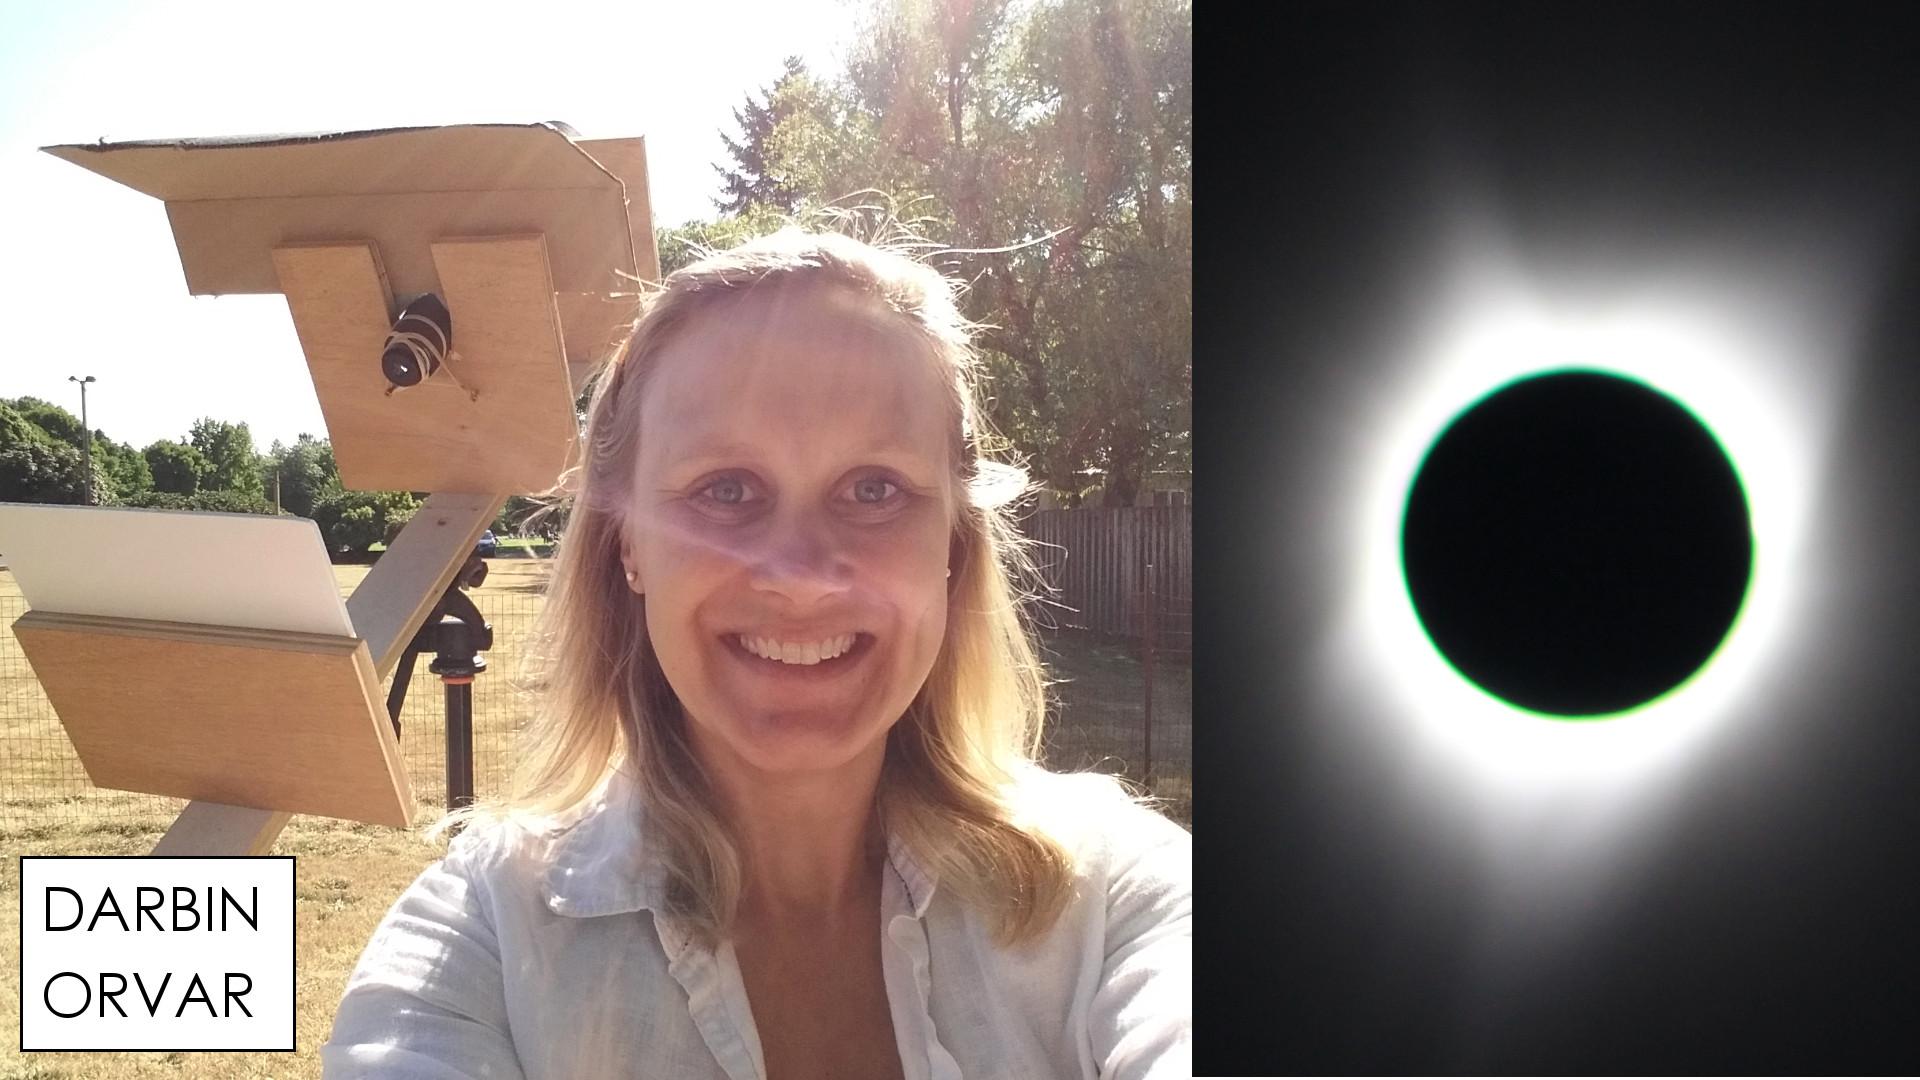 thumb_eclipse_experience01.jpg